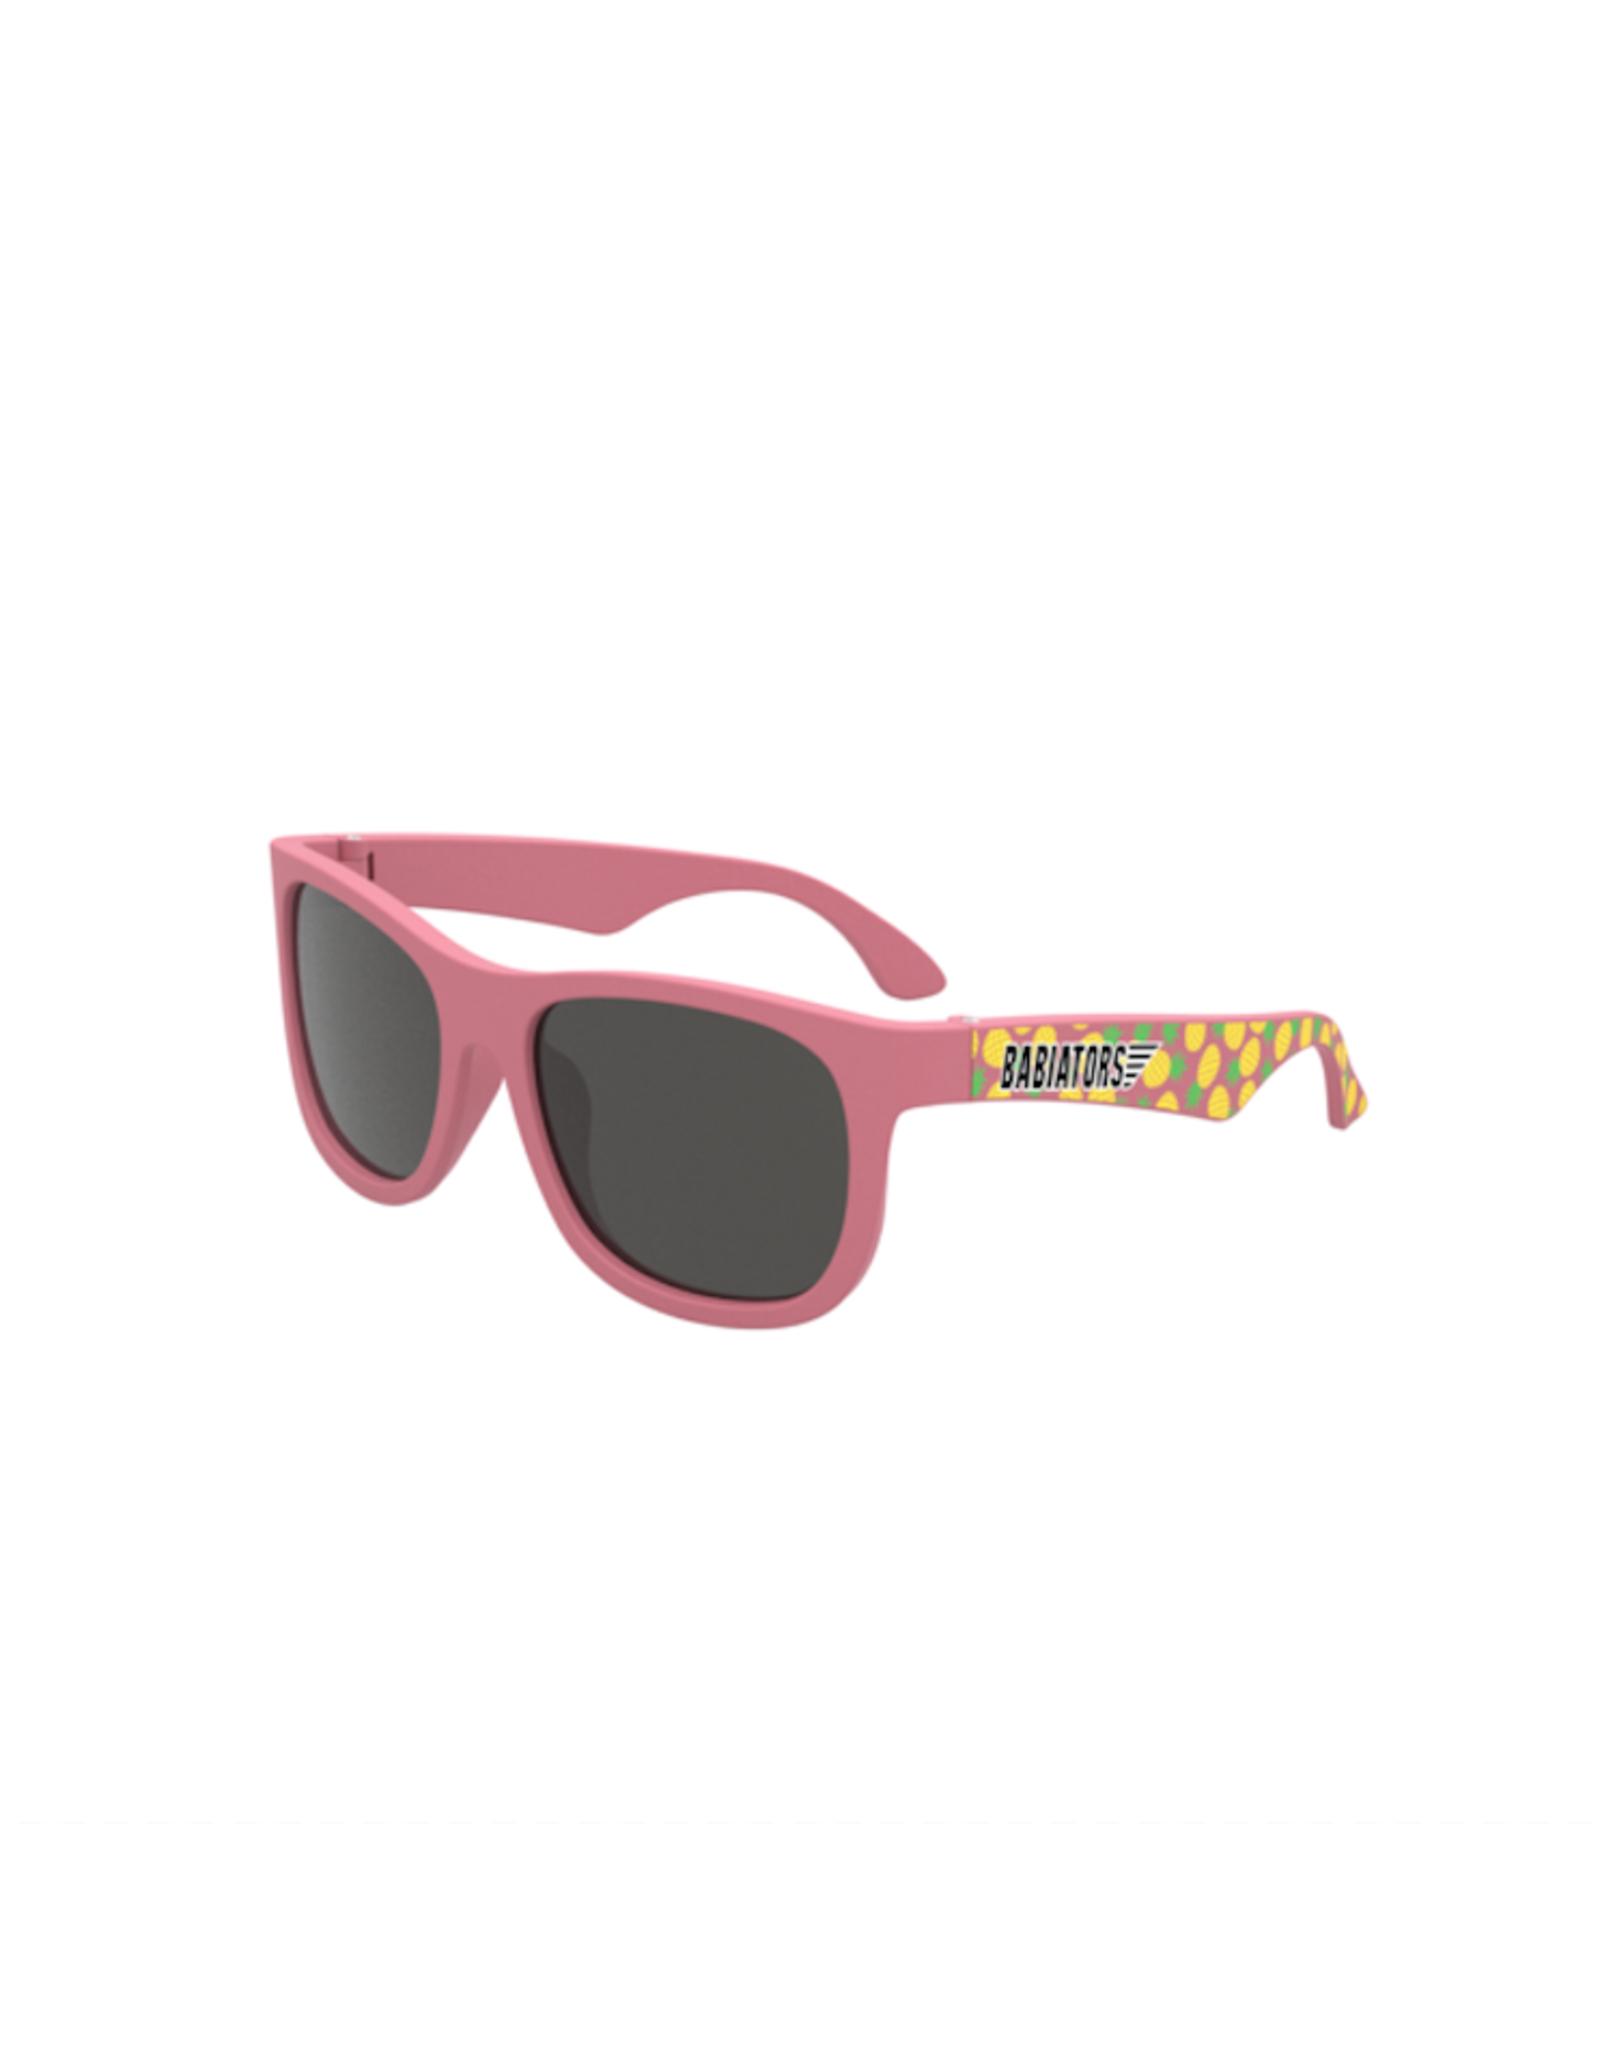 Babiators Limited Edition, Navigator, Sunglasses, Pineapple of my Eye Coral